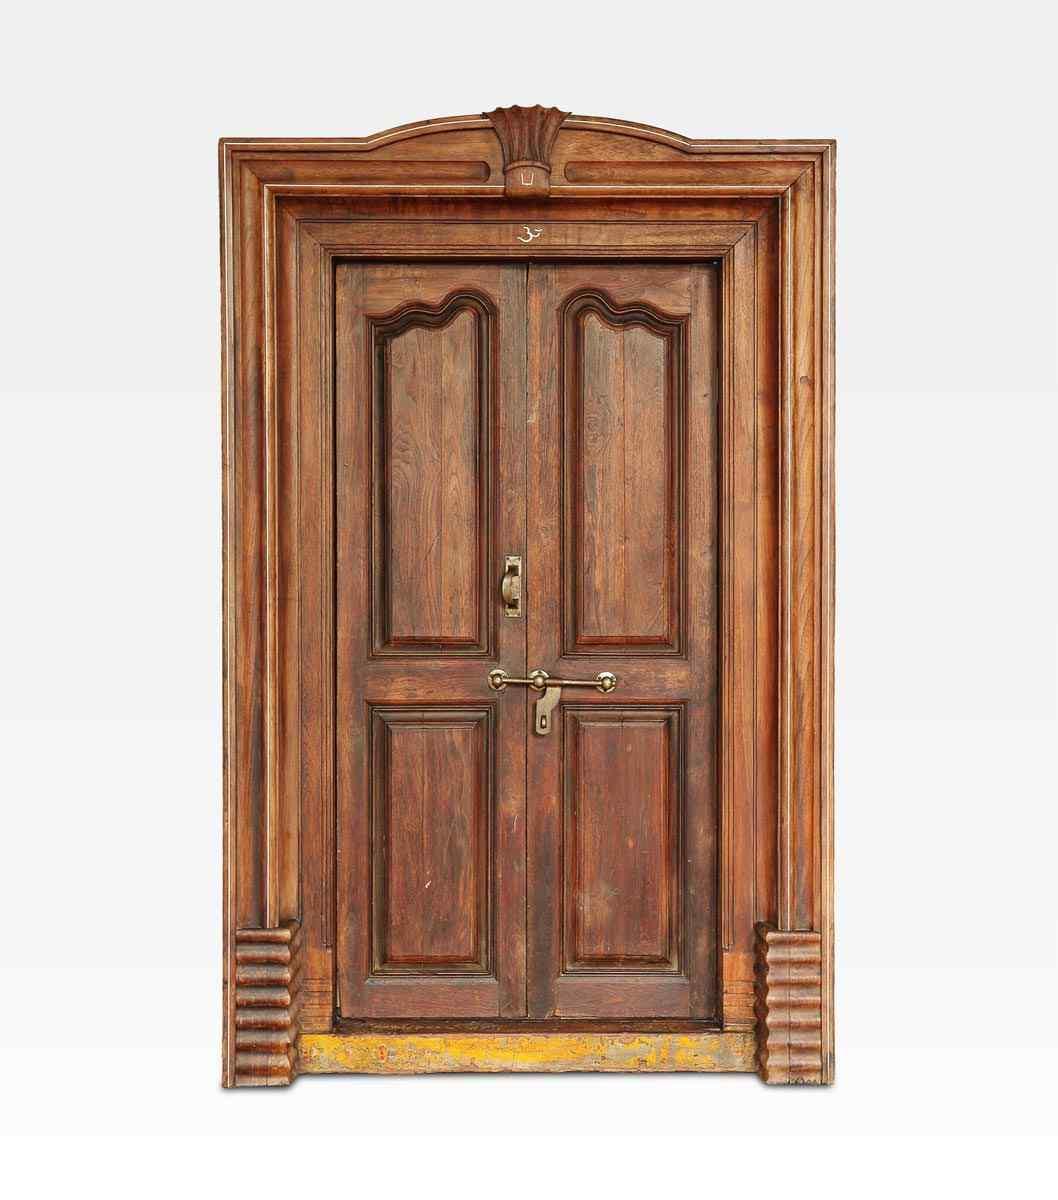 Porta indiana coloniale intagliata in legno di teak